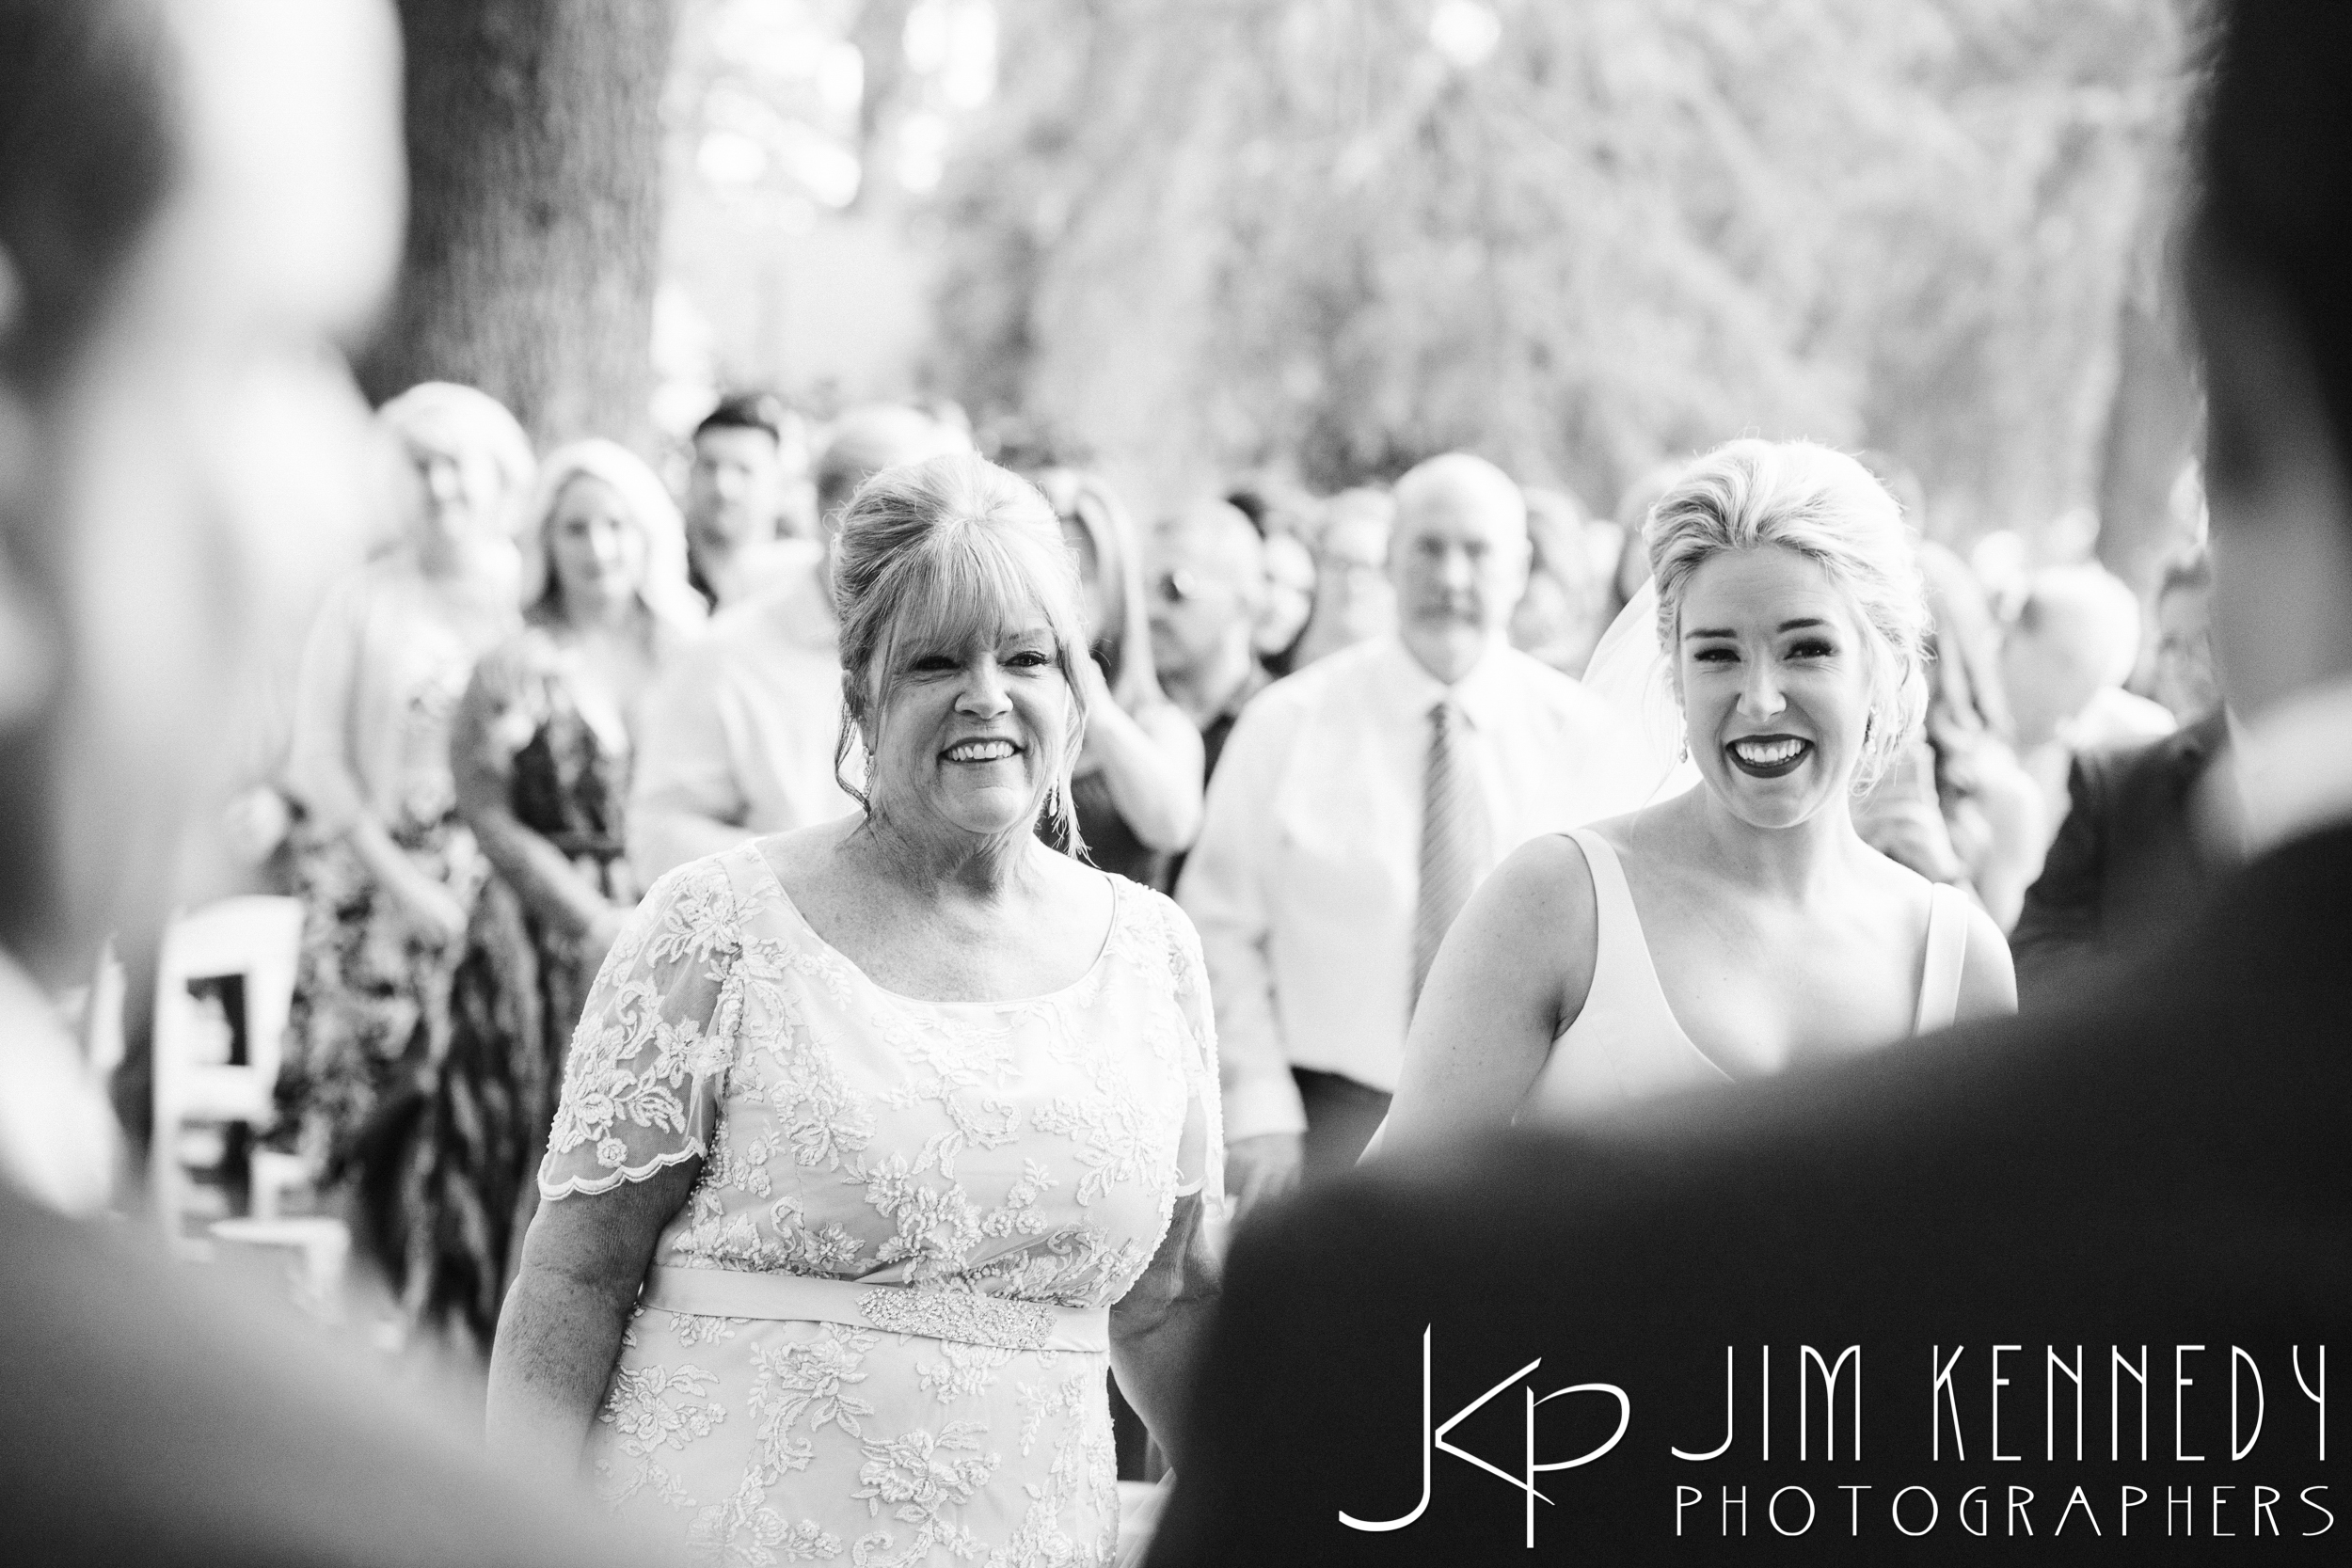 jim_kennedy_photographers_highland_springs_wedding_caitlyn_0104.jpg